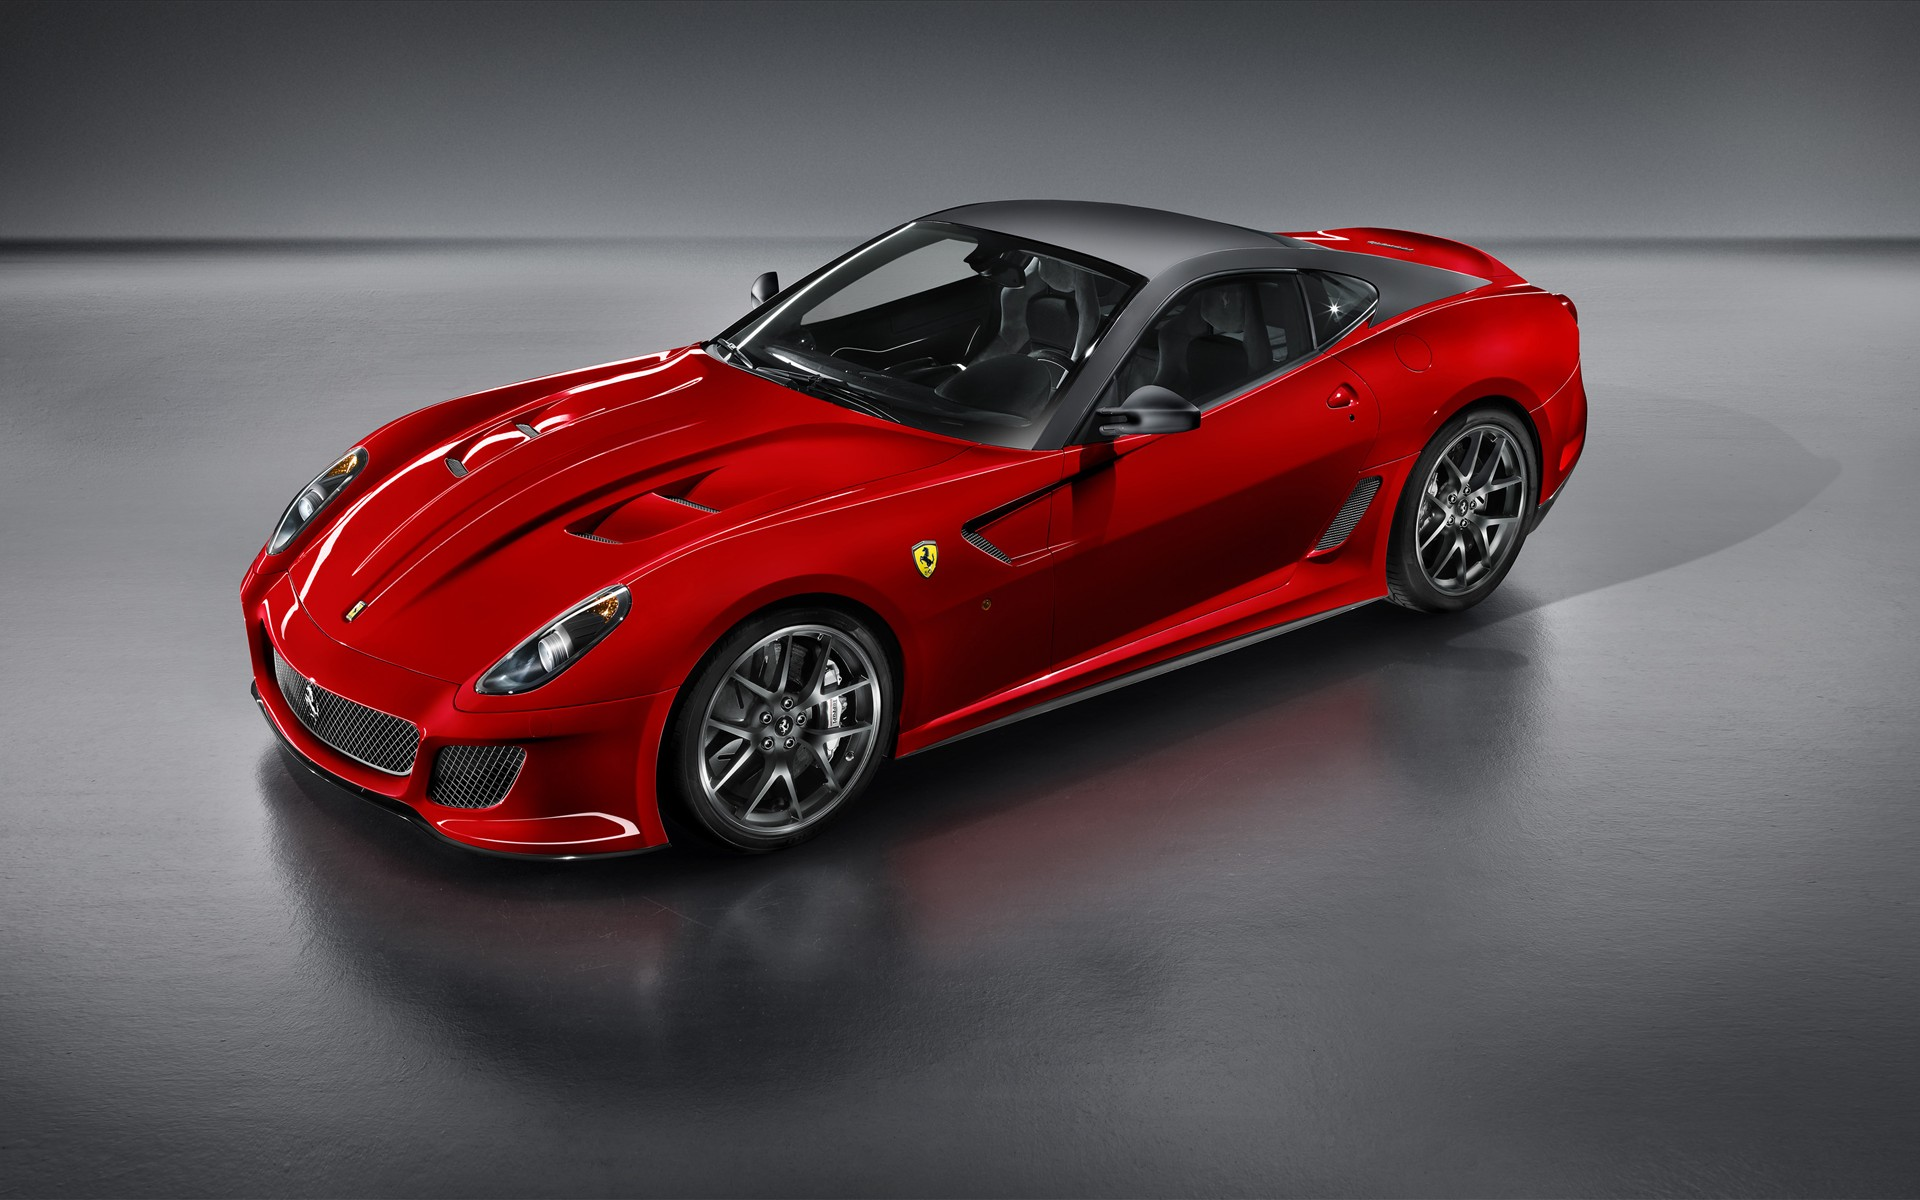 2011 Ferrari 599 GTO Wallpapers HD Wallpapers 1920x1200